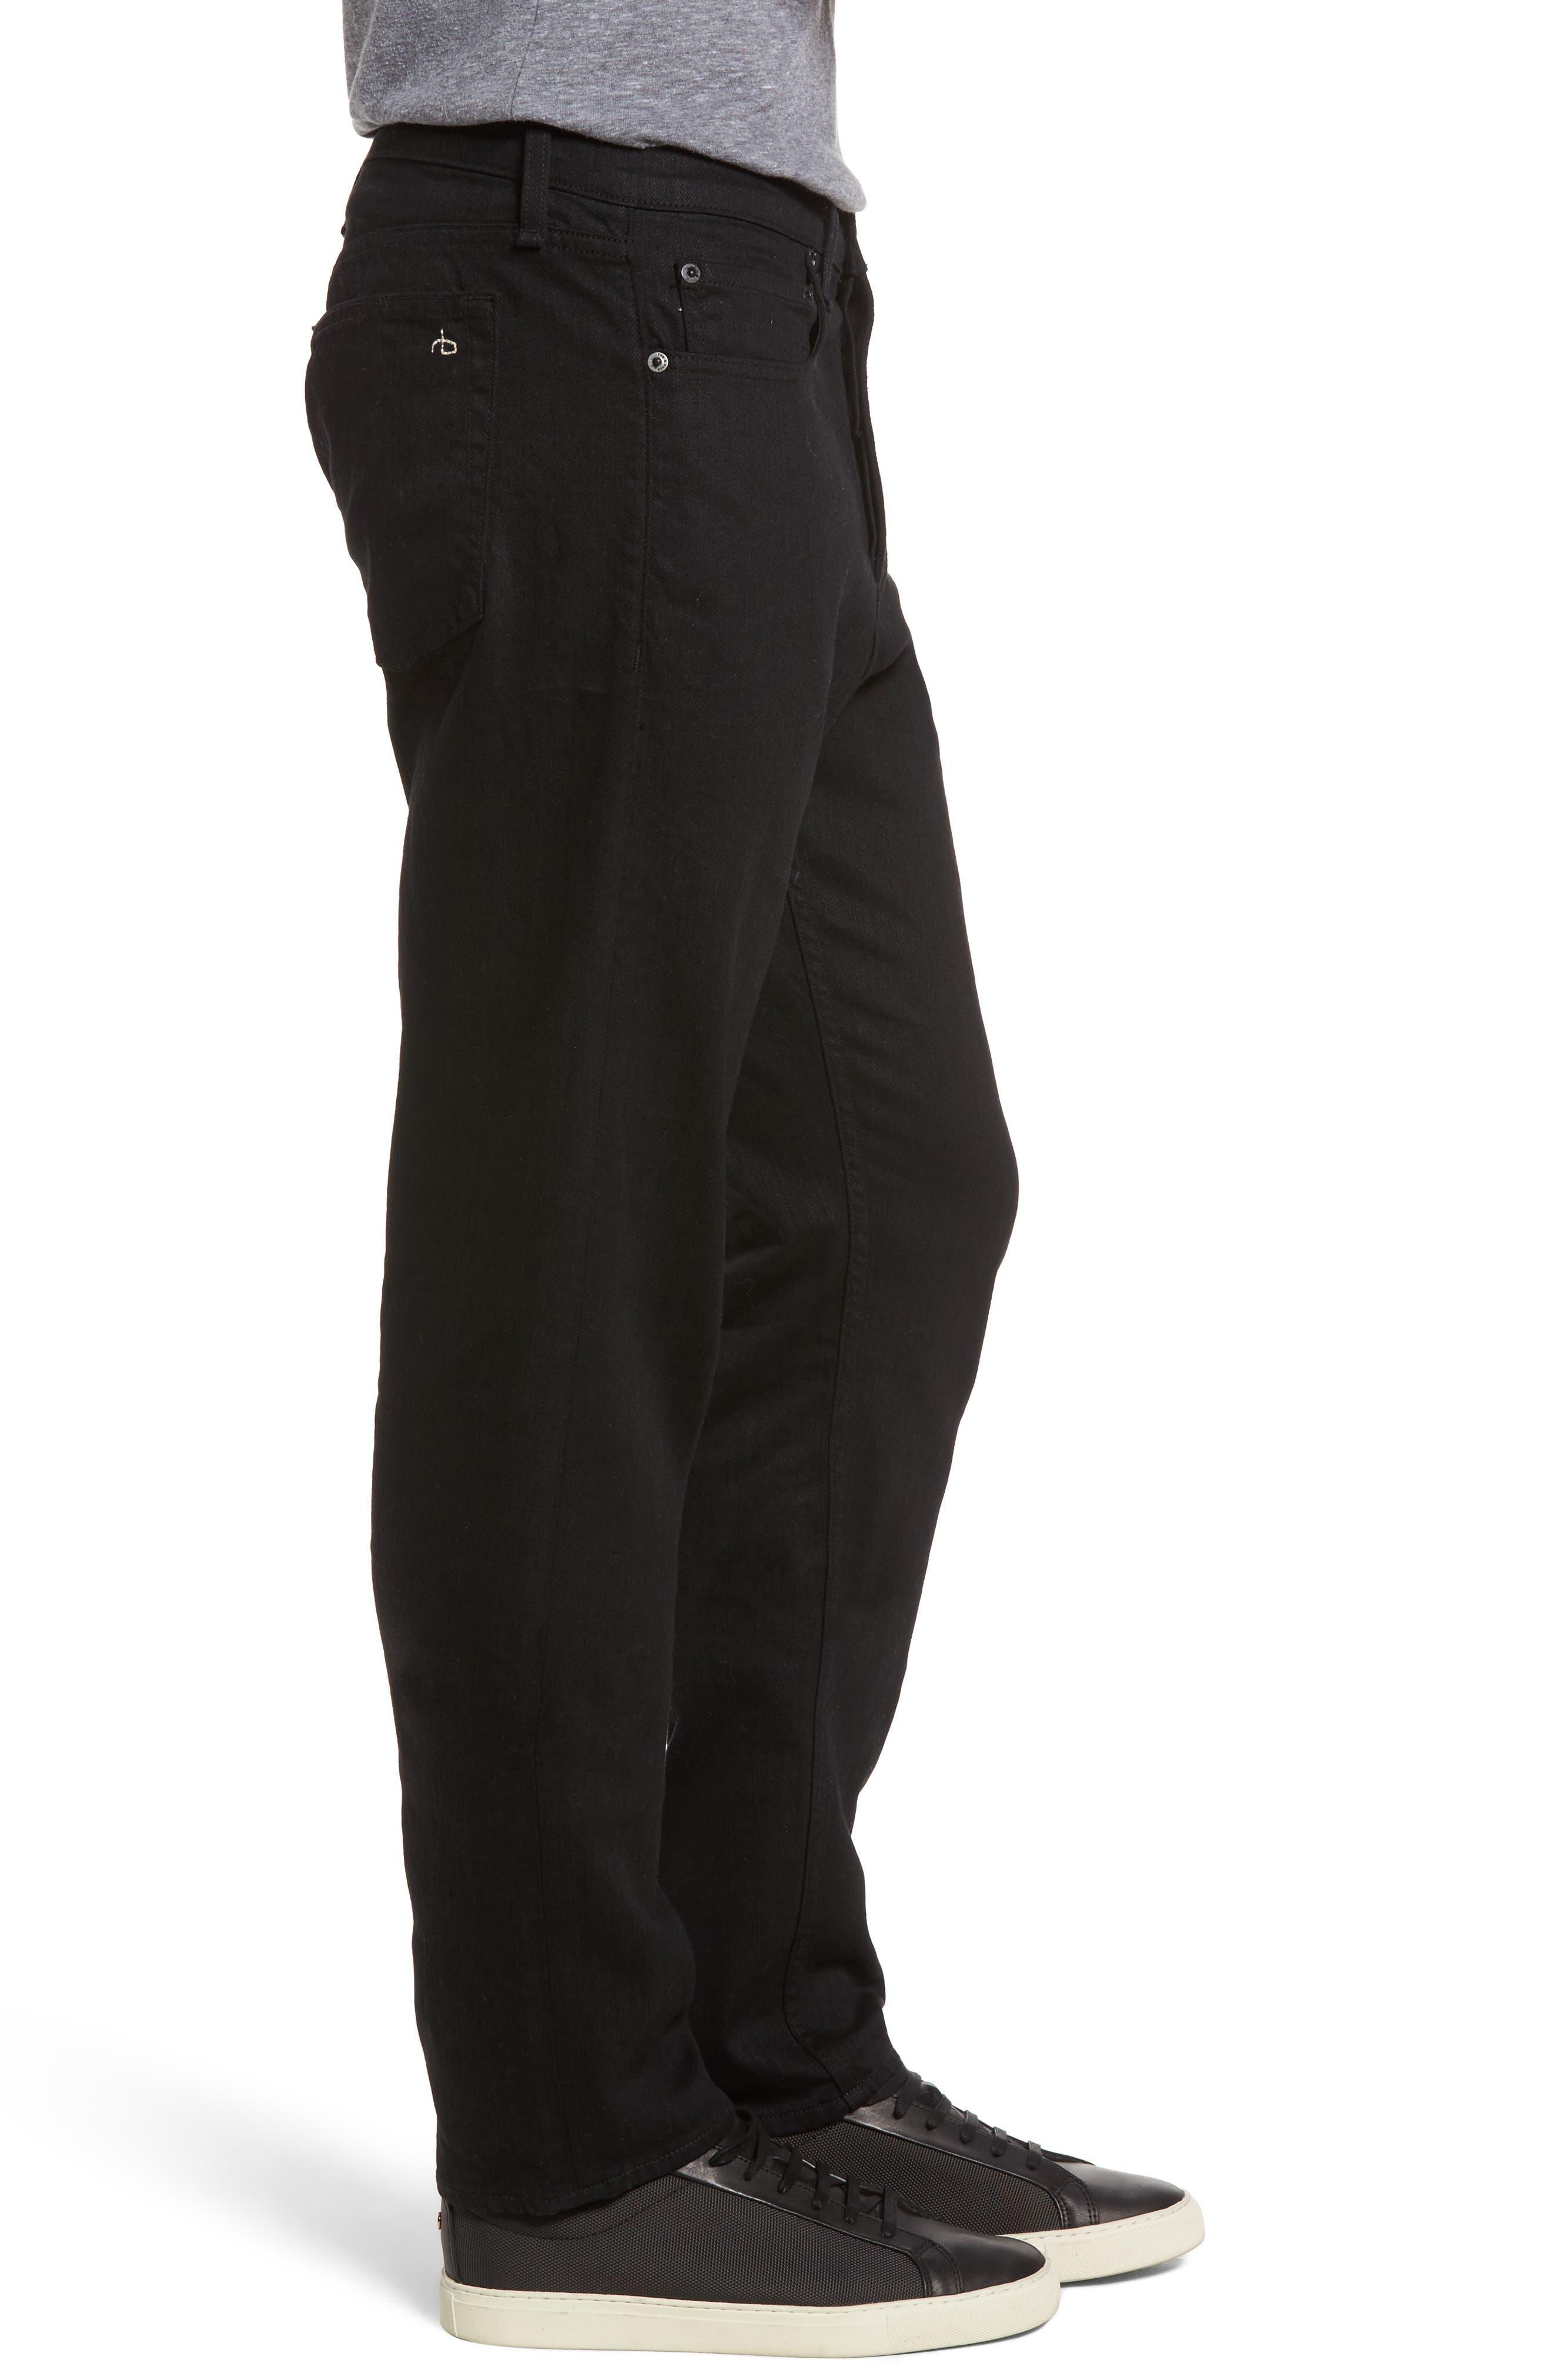 RAG & BONE, Fit 3 Slim Straight Leg Jeans, Alternate thumbnail 4, color, BLACK